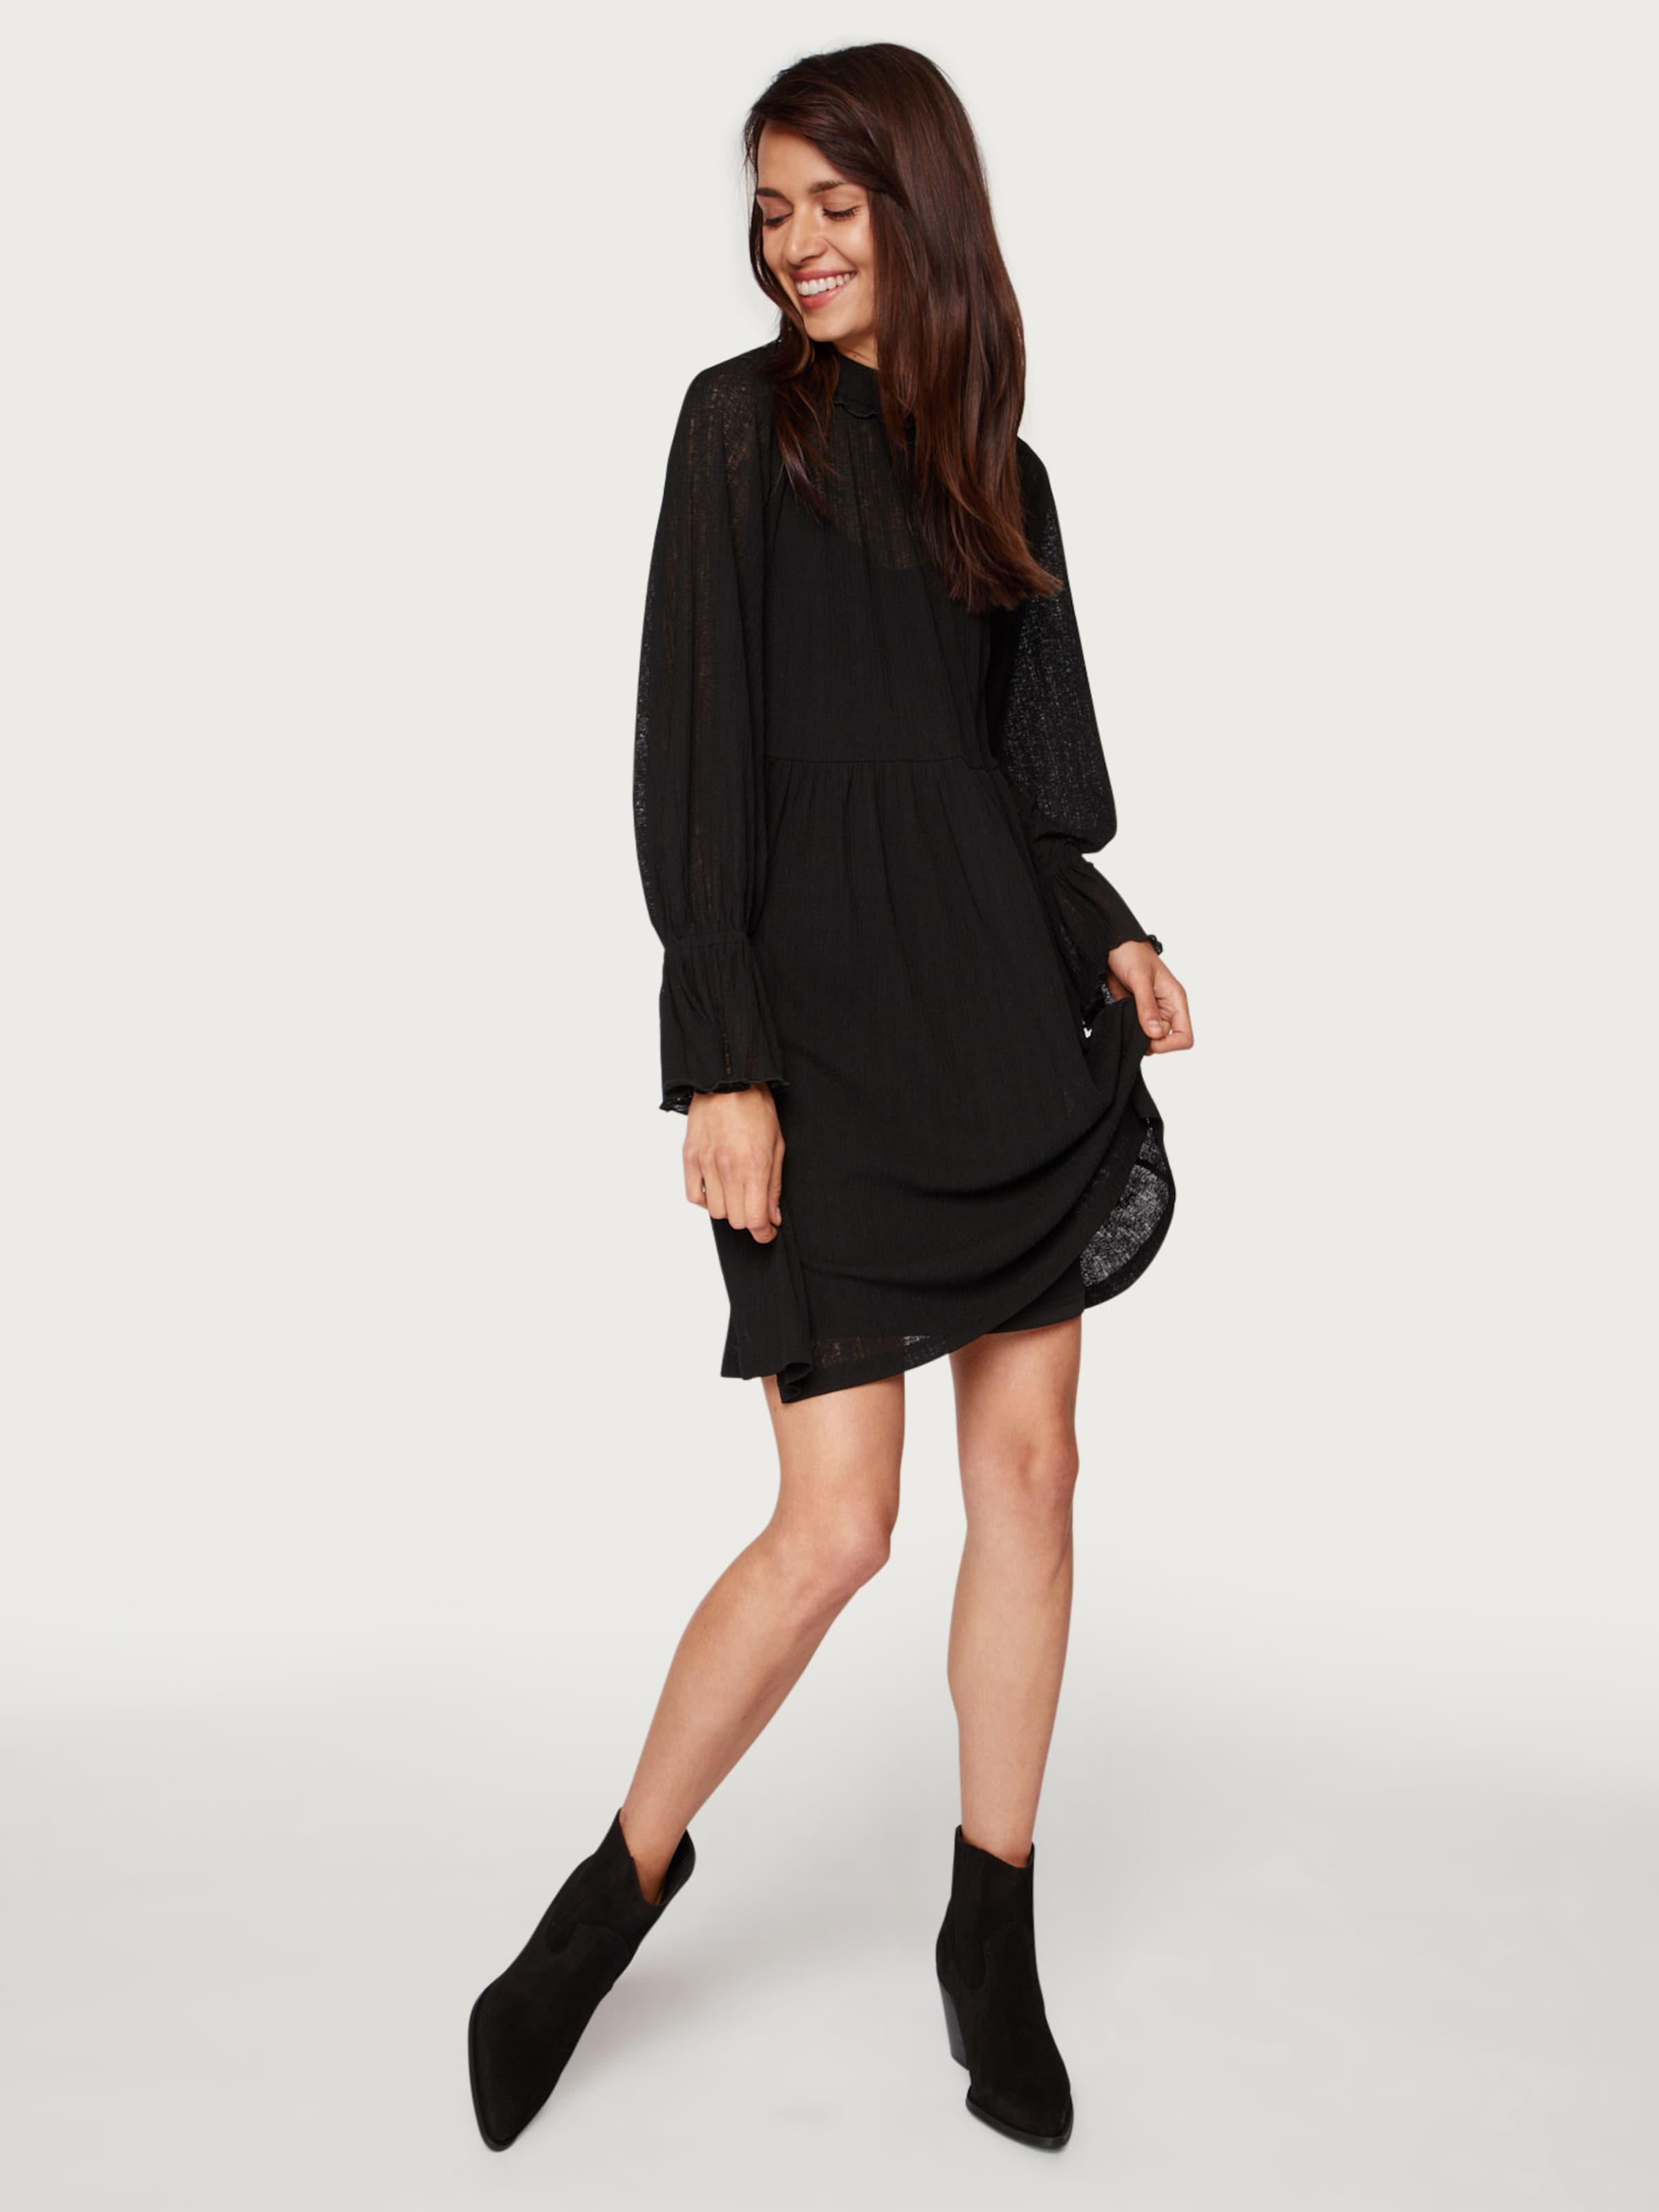 Edited Kleid In Edited 'meline' Schwarz In Schwarz Kleid 'meline' Edited Kleid HI9YeD2WE